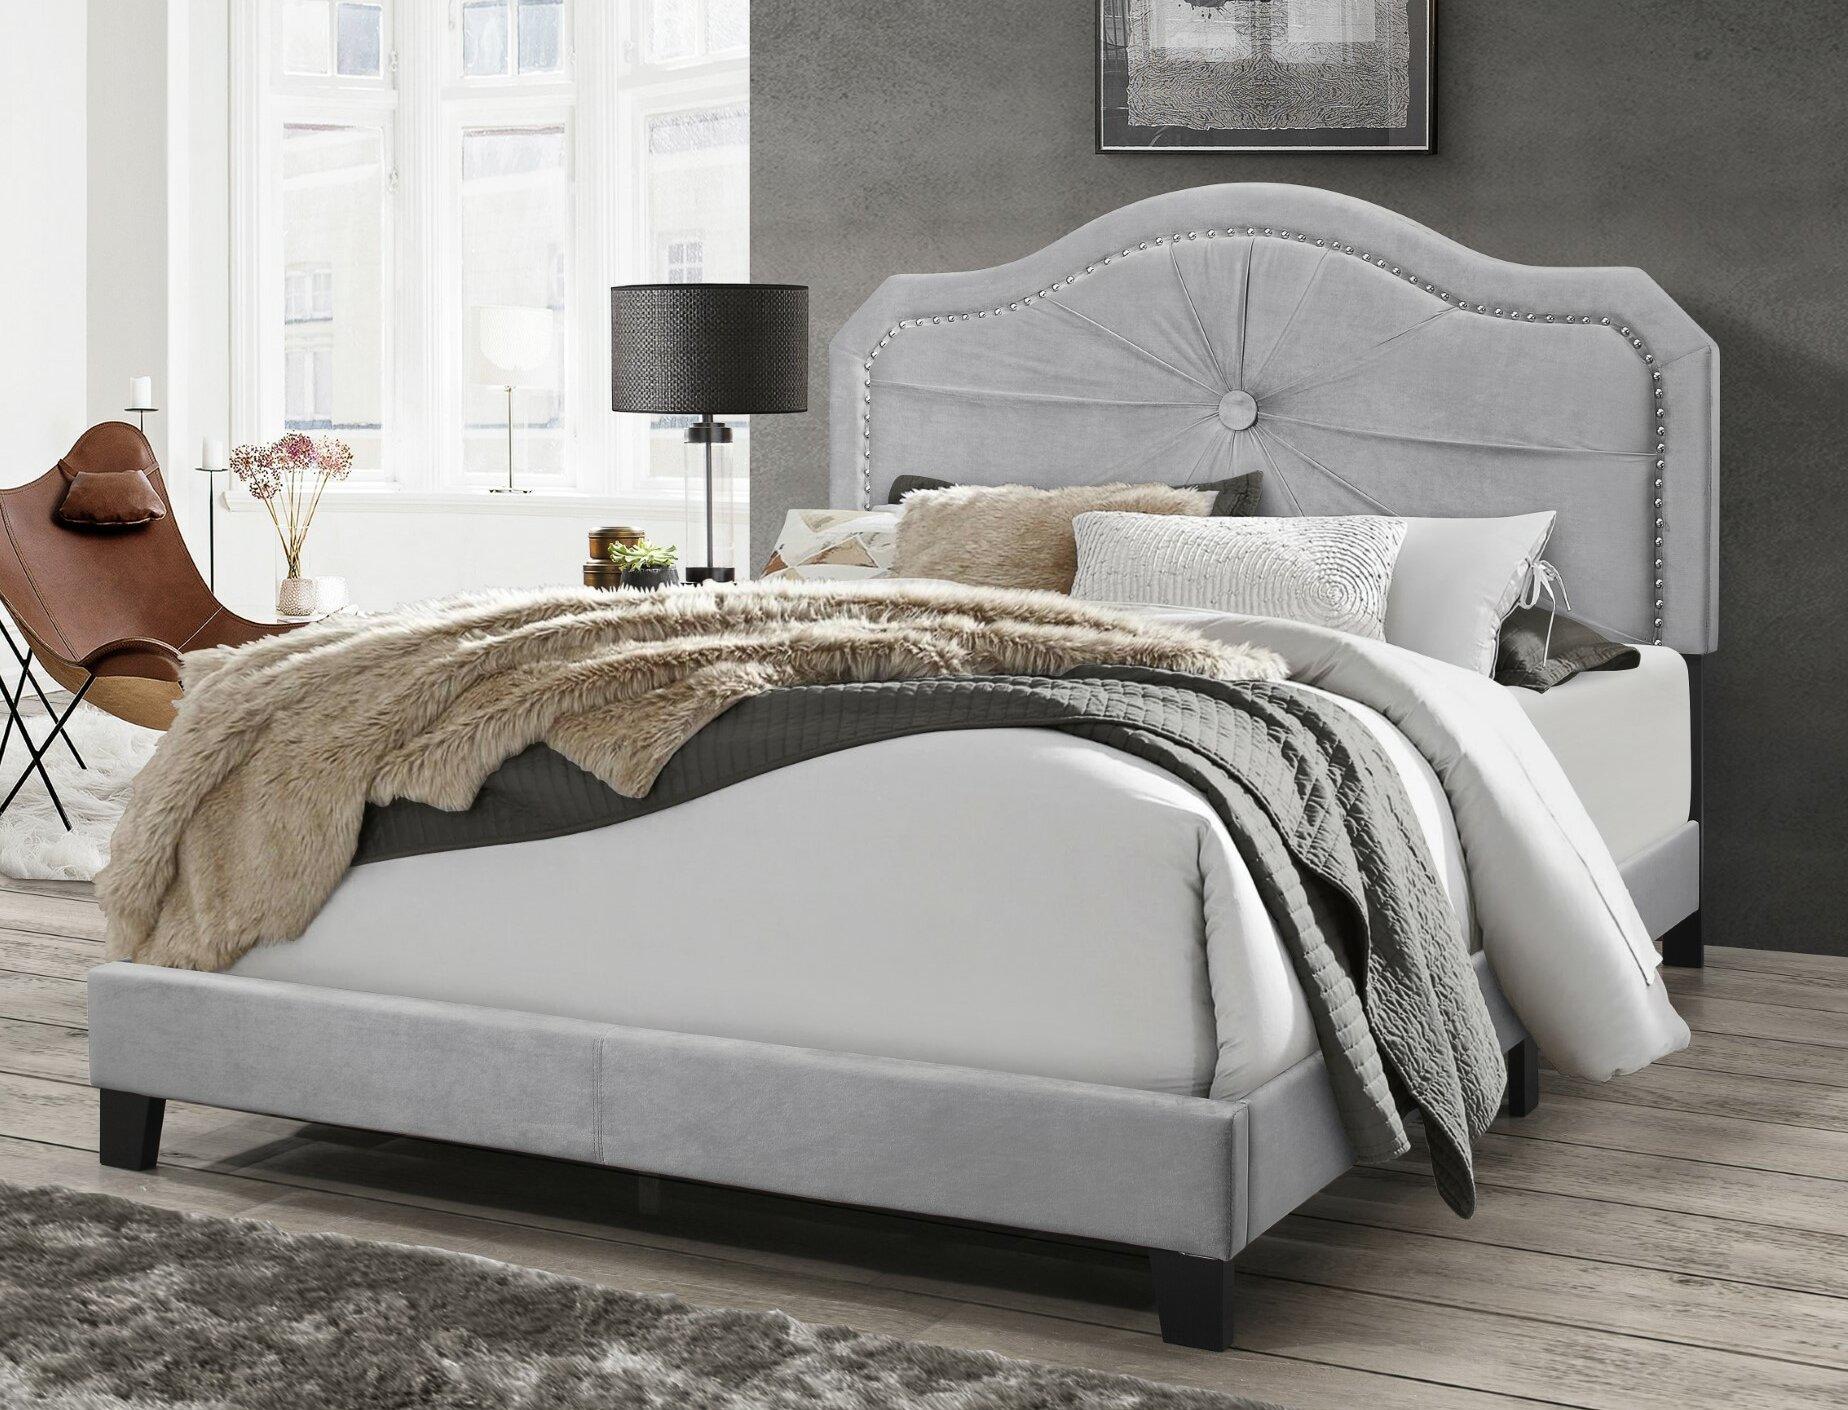 House Of Hampton Earby Upholstered Standard Bed Reviews Wayfair